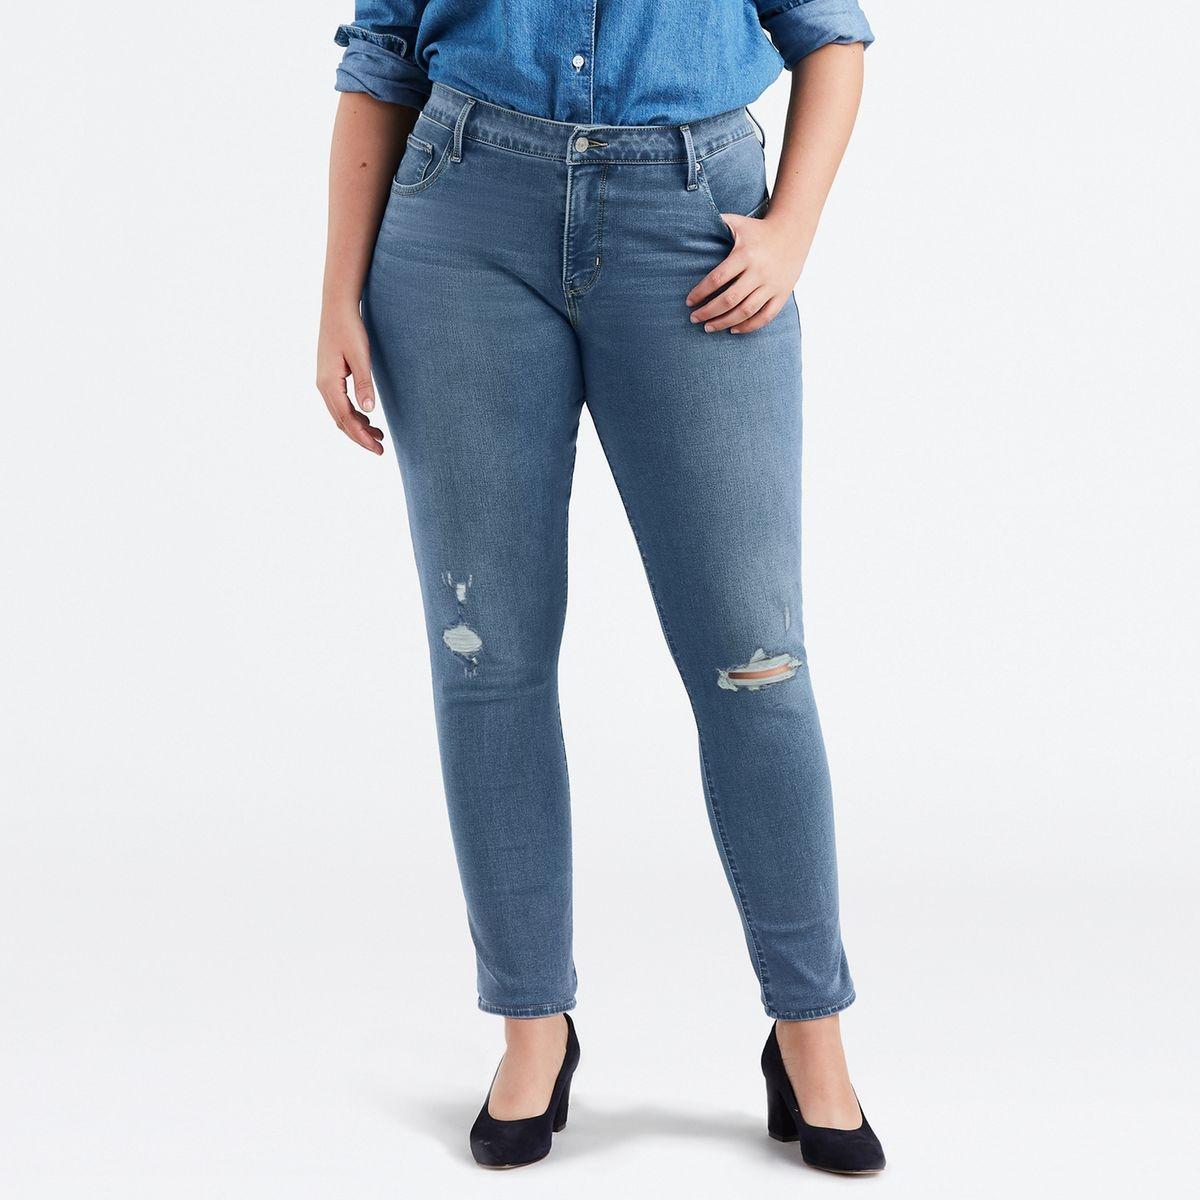 Jean 311 Levis Plus Shaping Skinny